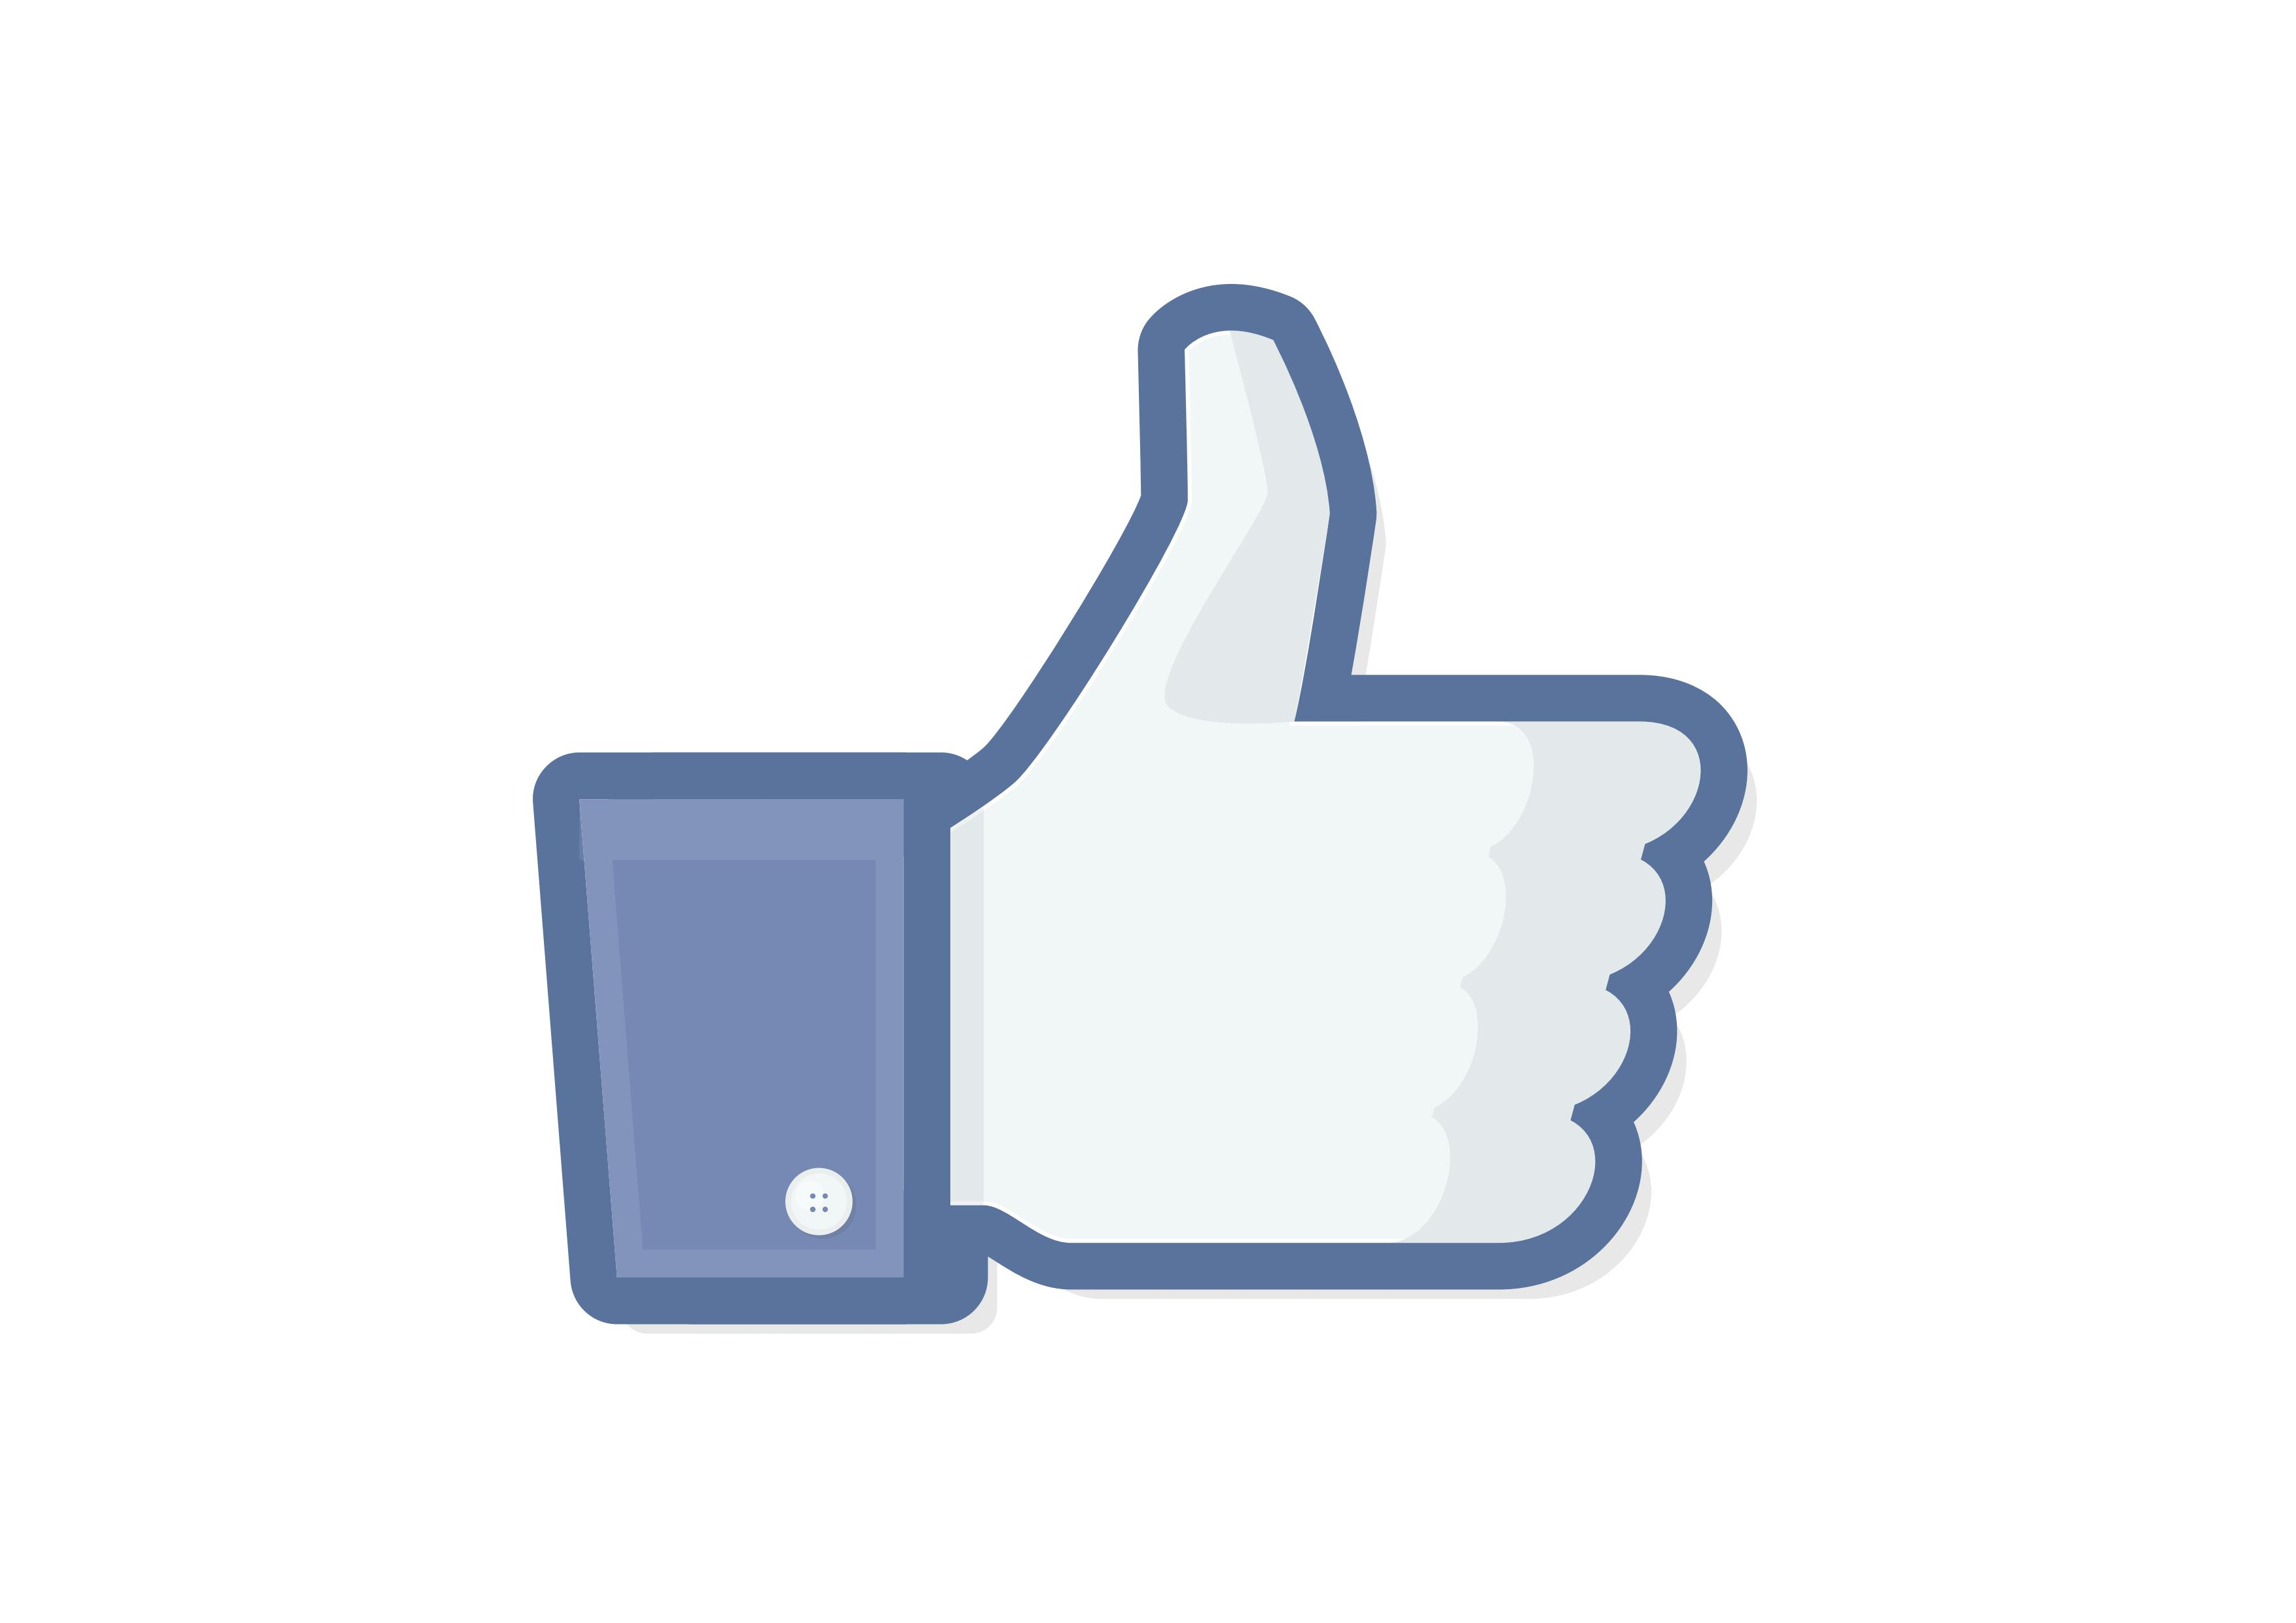 Clipart like. Facebook logo clipartfest info